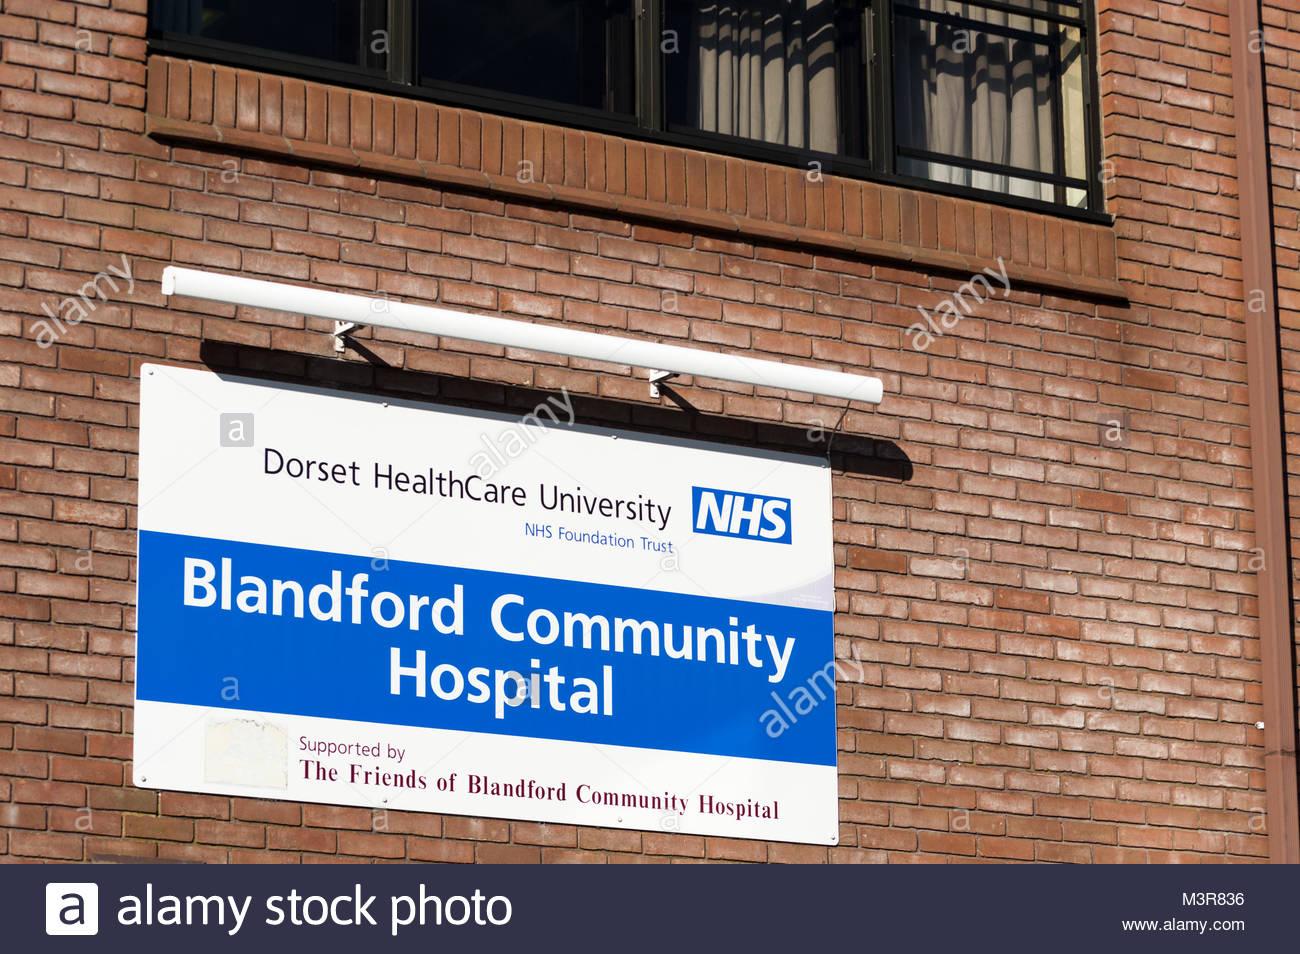 Wall sign outside Blandford Forum Community Hospital, Dorset, England - Stock Image